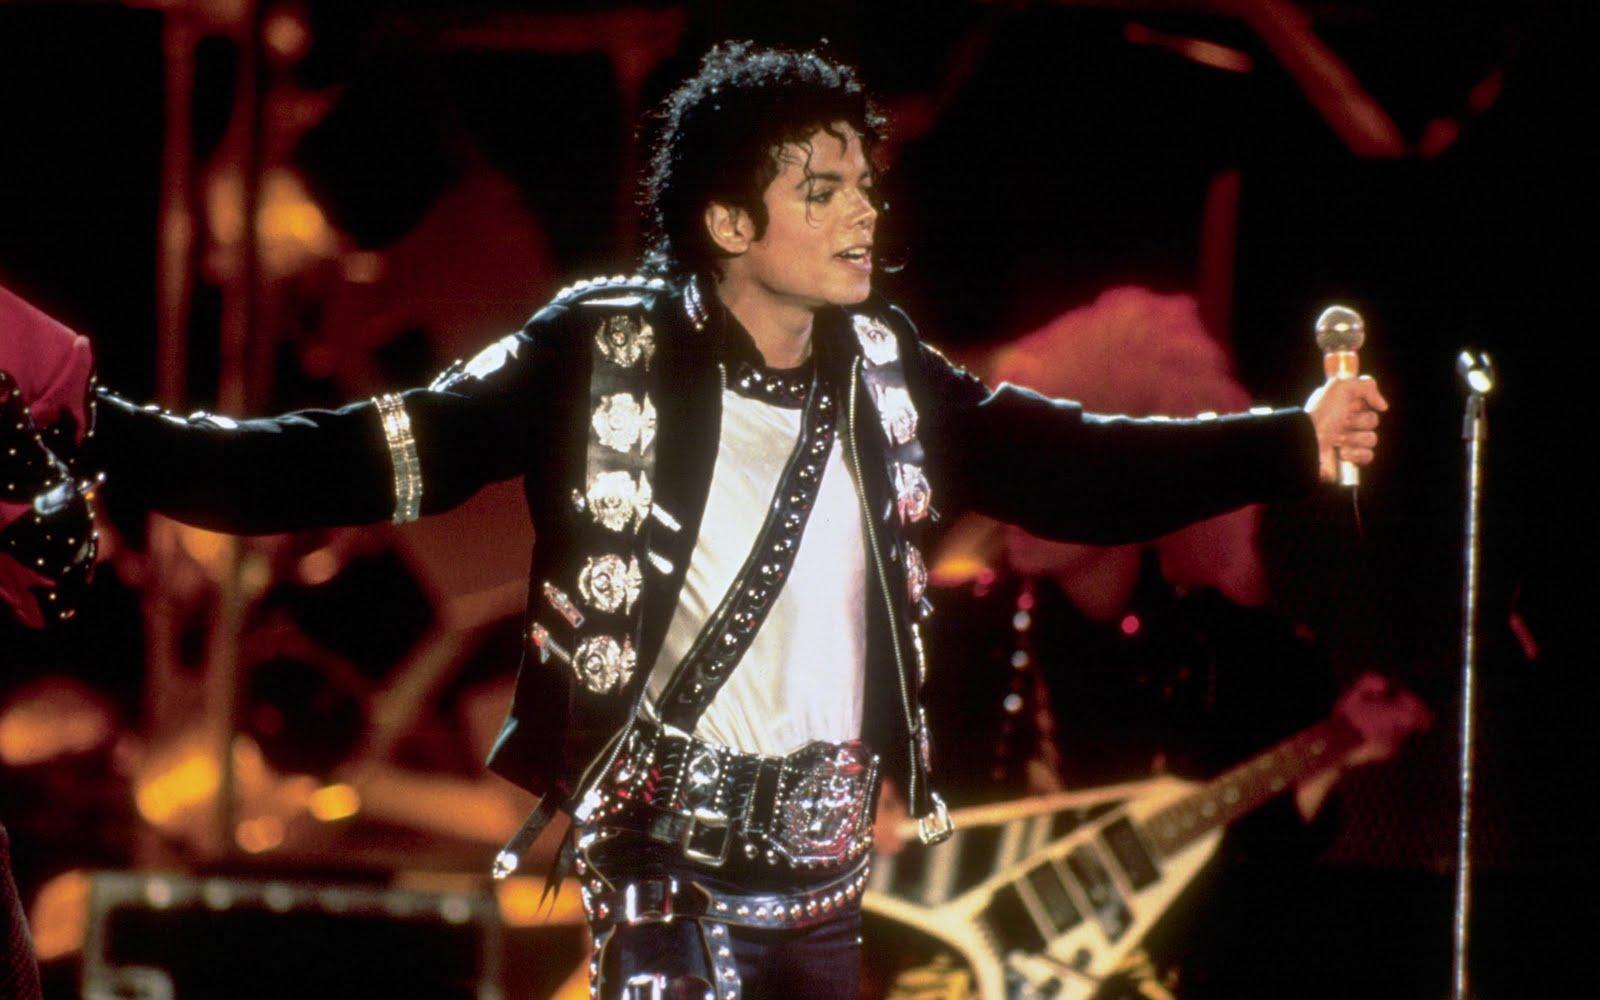 Michael Jackson Smooth Criminal Wallpapers Wallpaper Hd